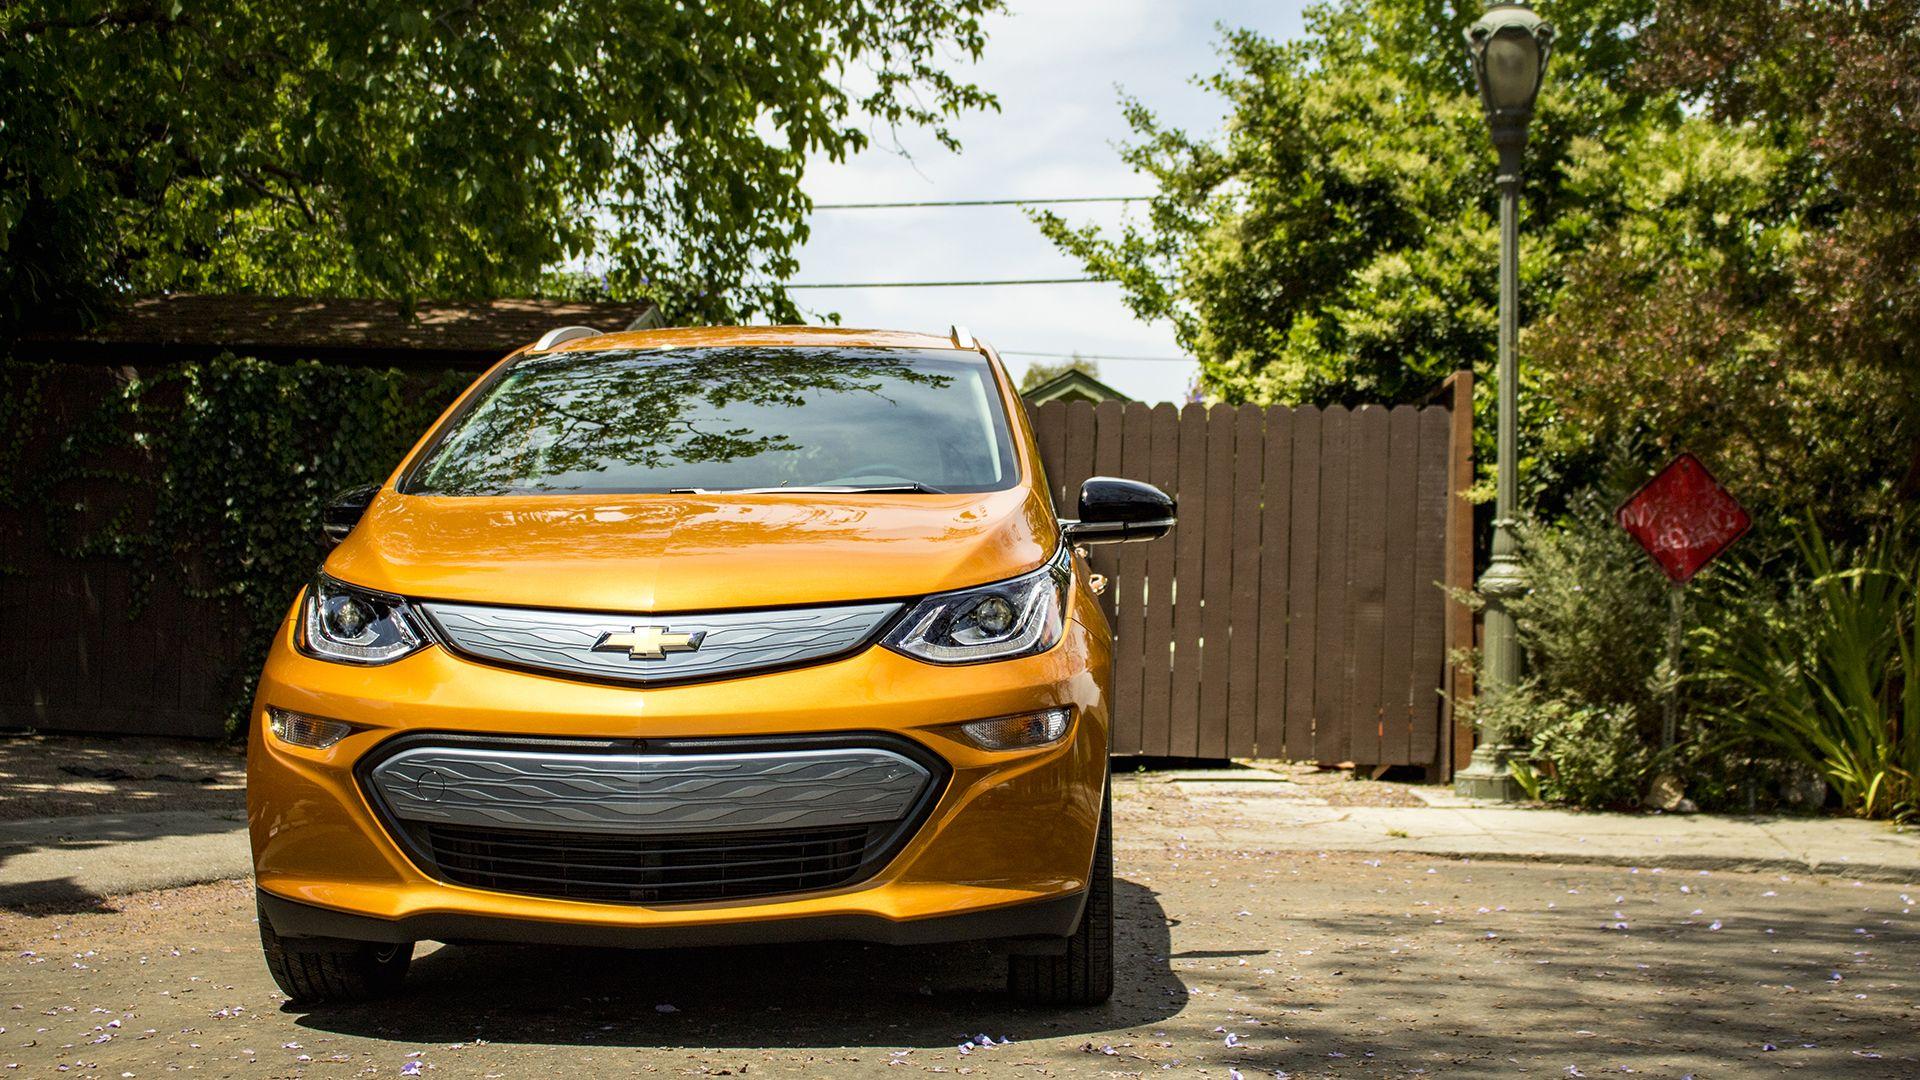 2018 Chevrolet Bolt Premier Ev Car Review Gm Builds The First Real M Market Electric Drive